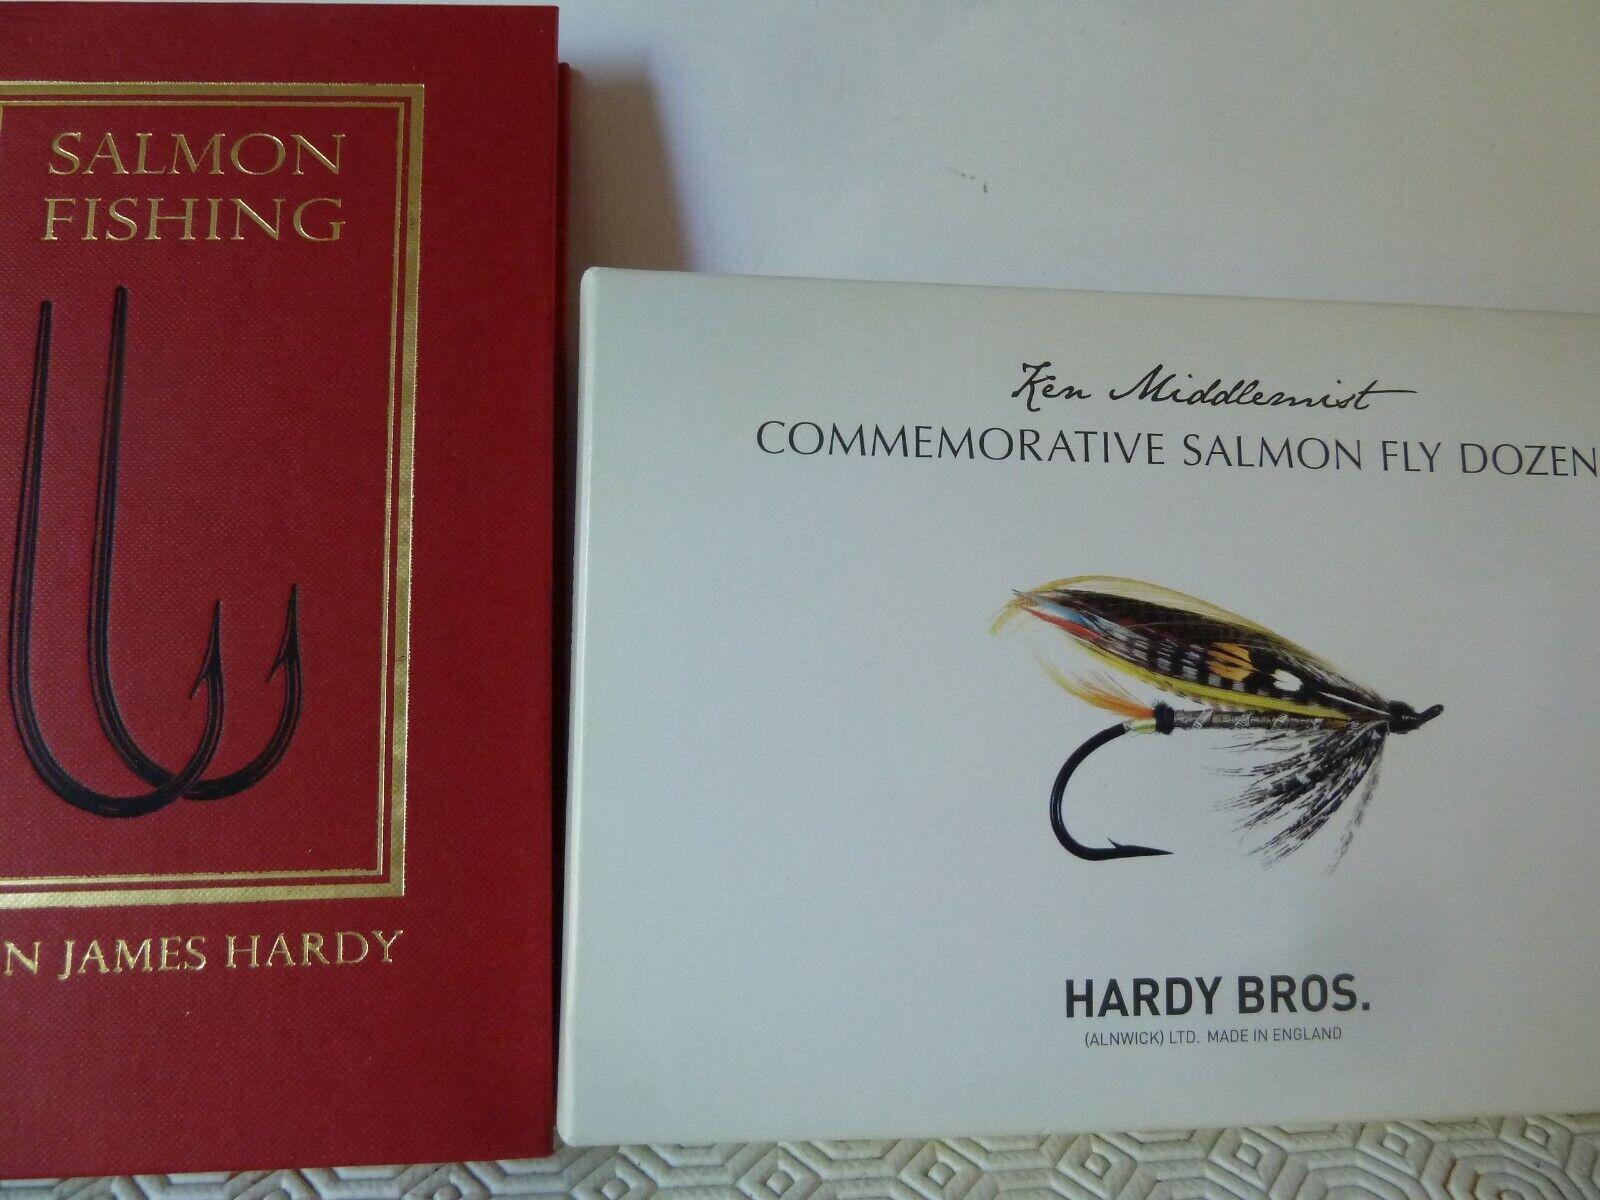 Hardy Bros Ken Middlemist Commemorative Salmon Fly Dozen  - Limited Edition No.41  order now enjoy big discount